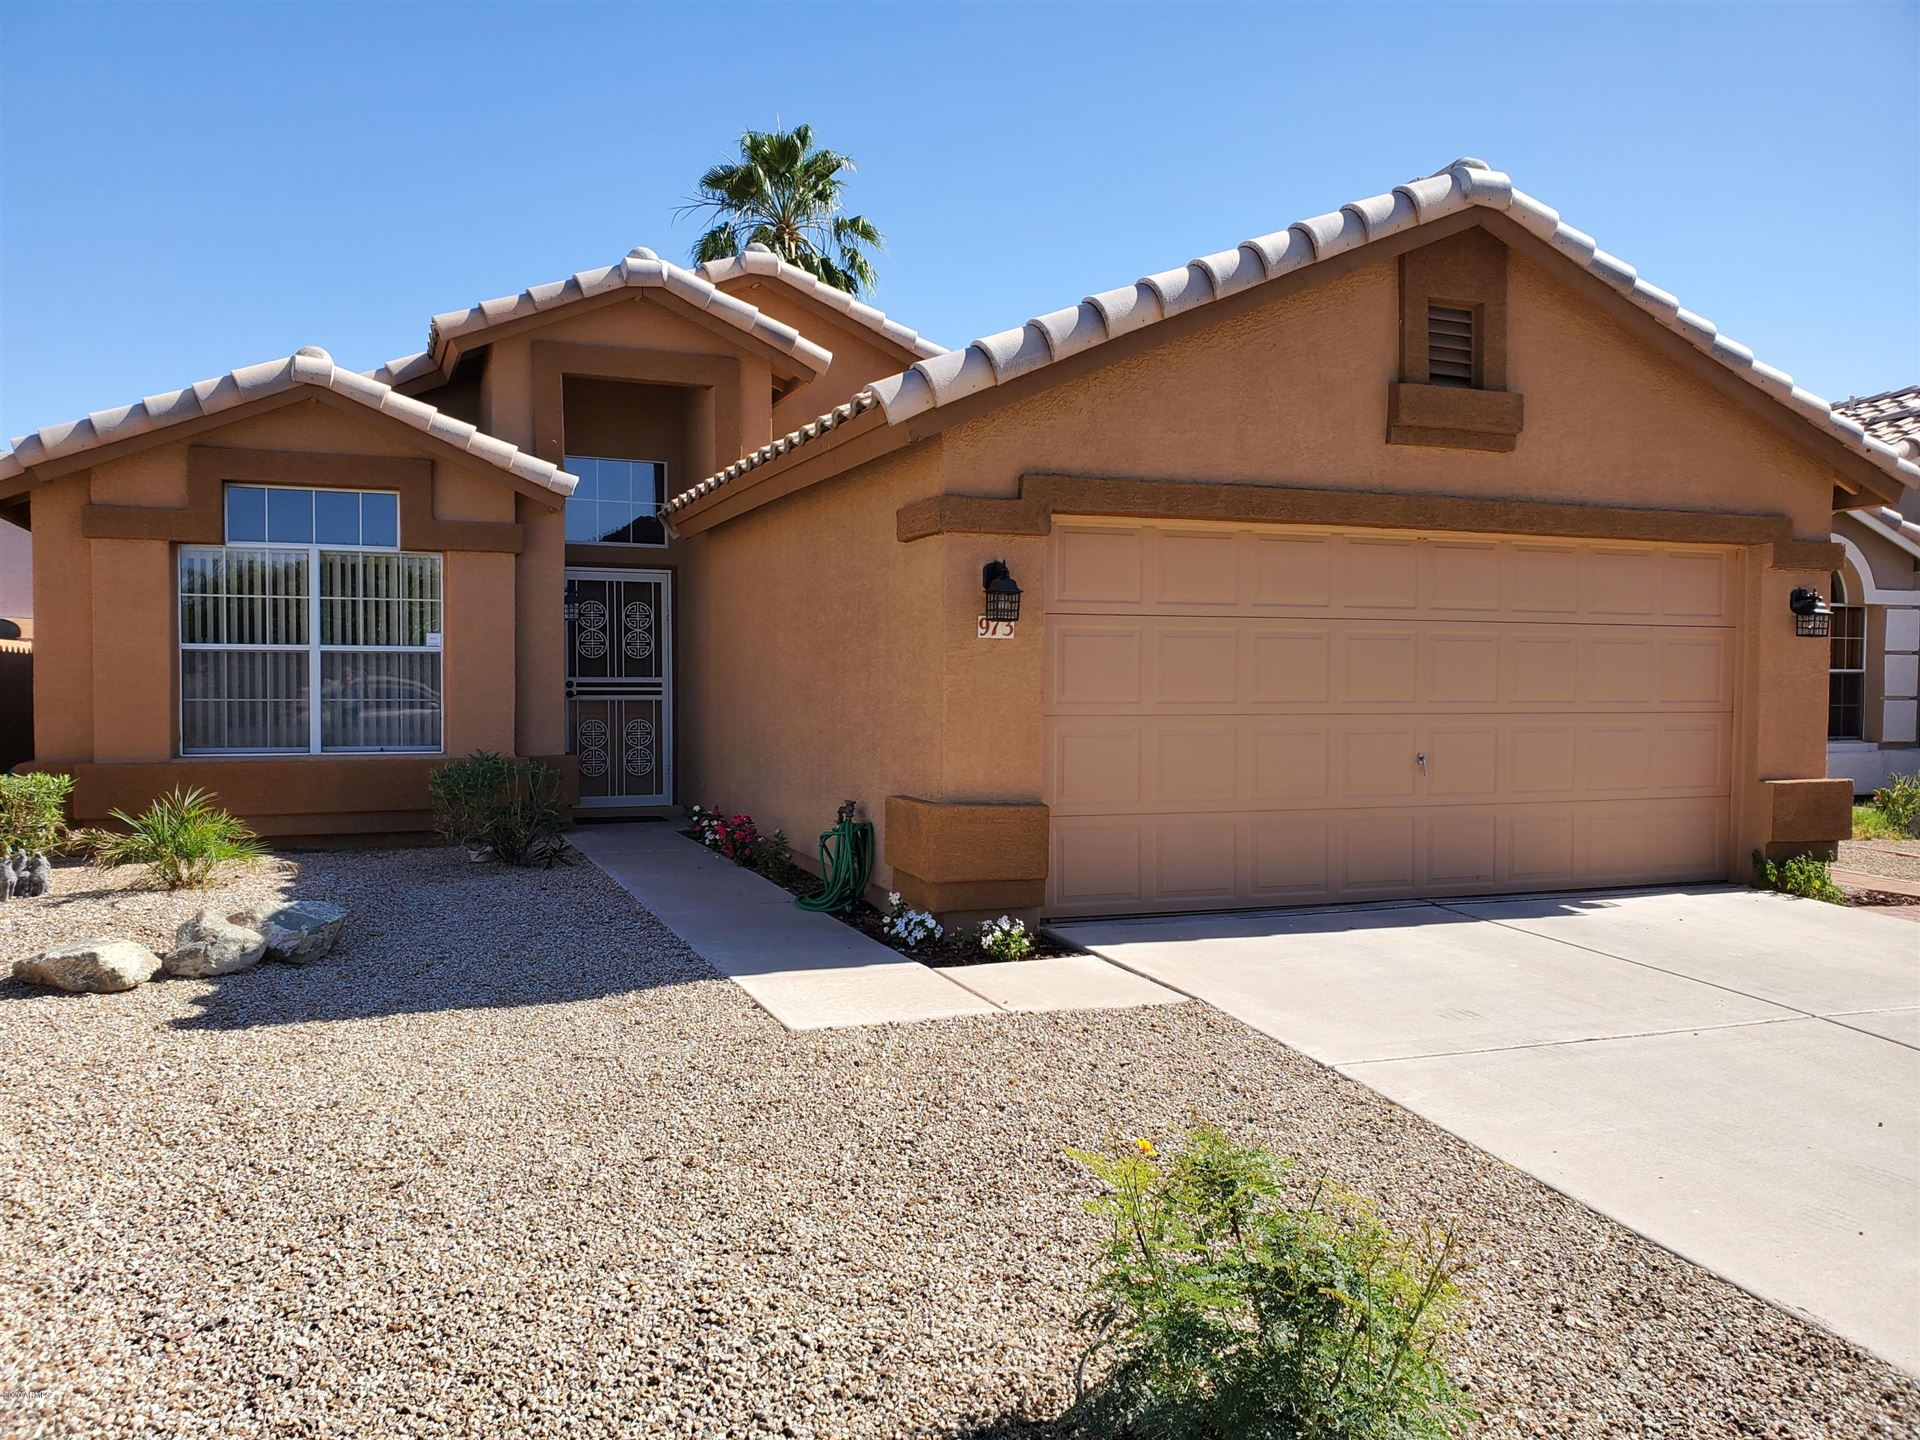 973 E CONSTITUTION Drive, Chandler, AZ 85225 - #: 6080818